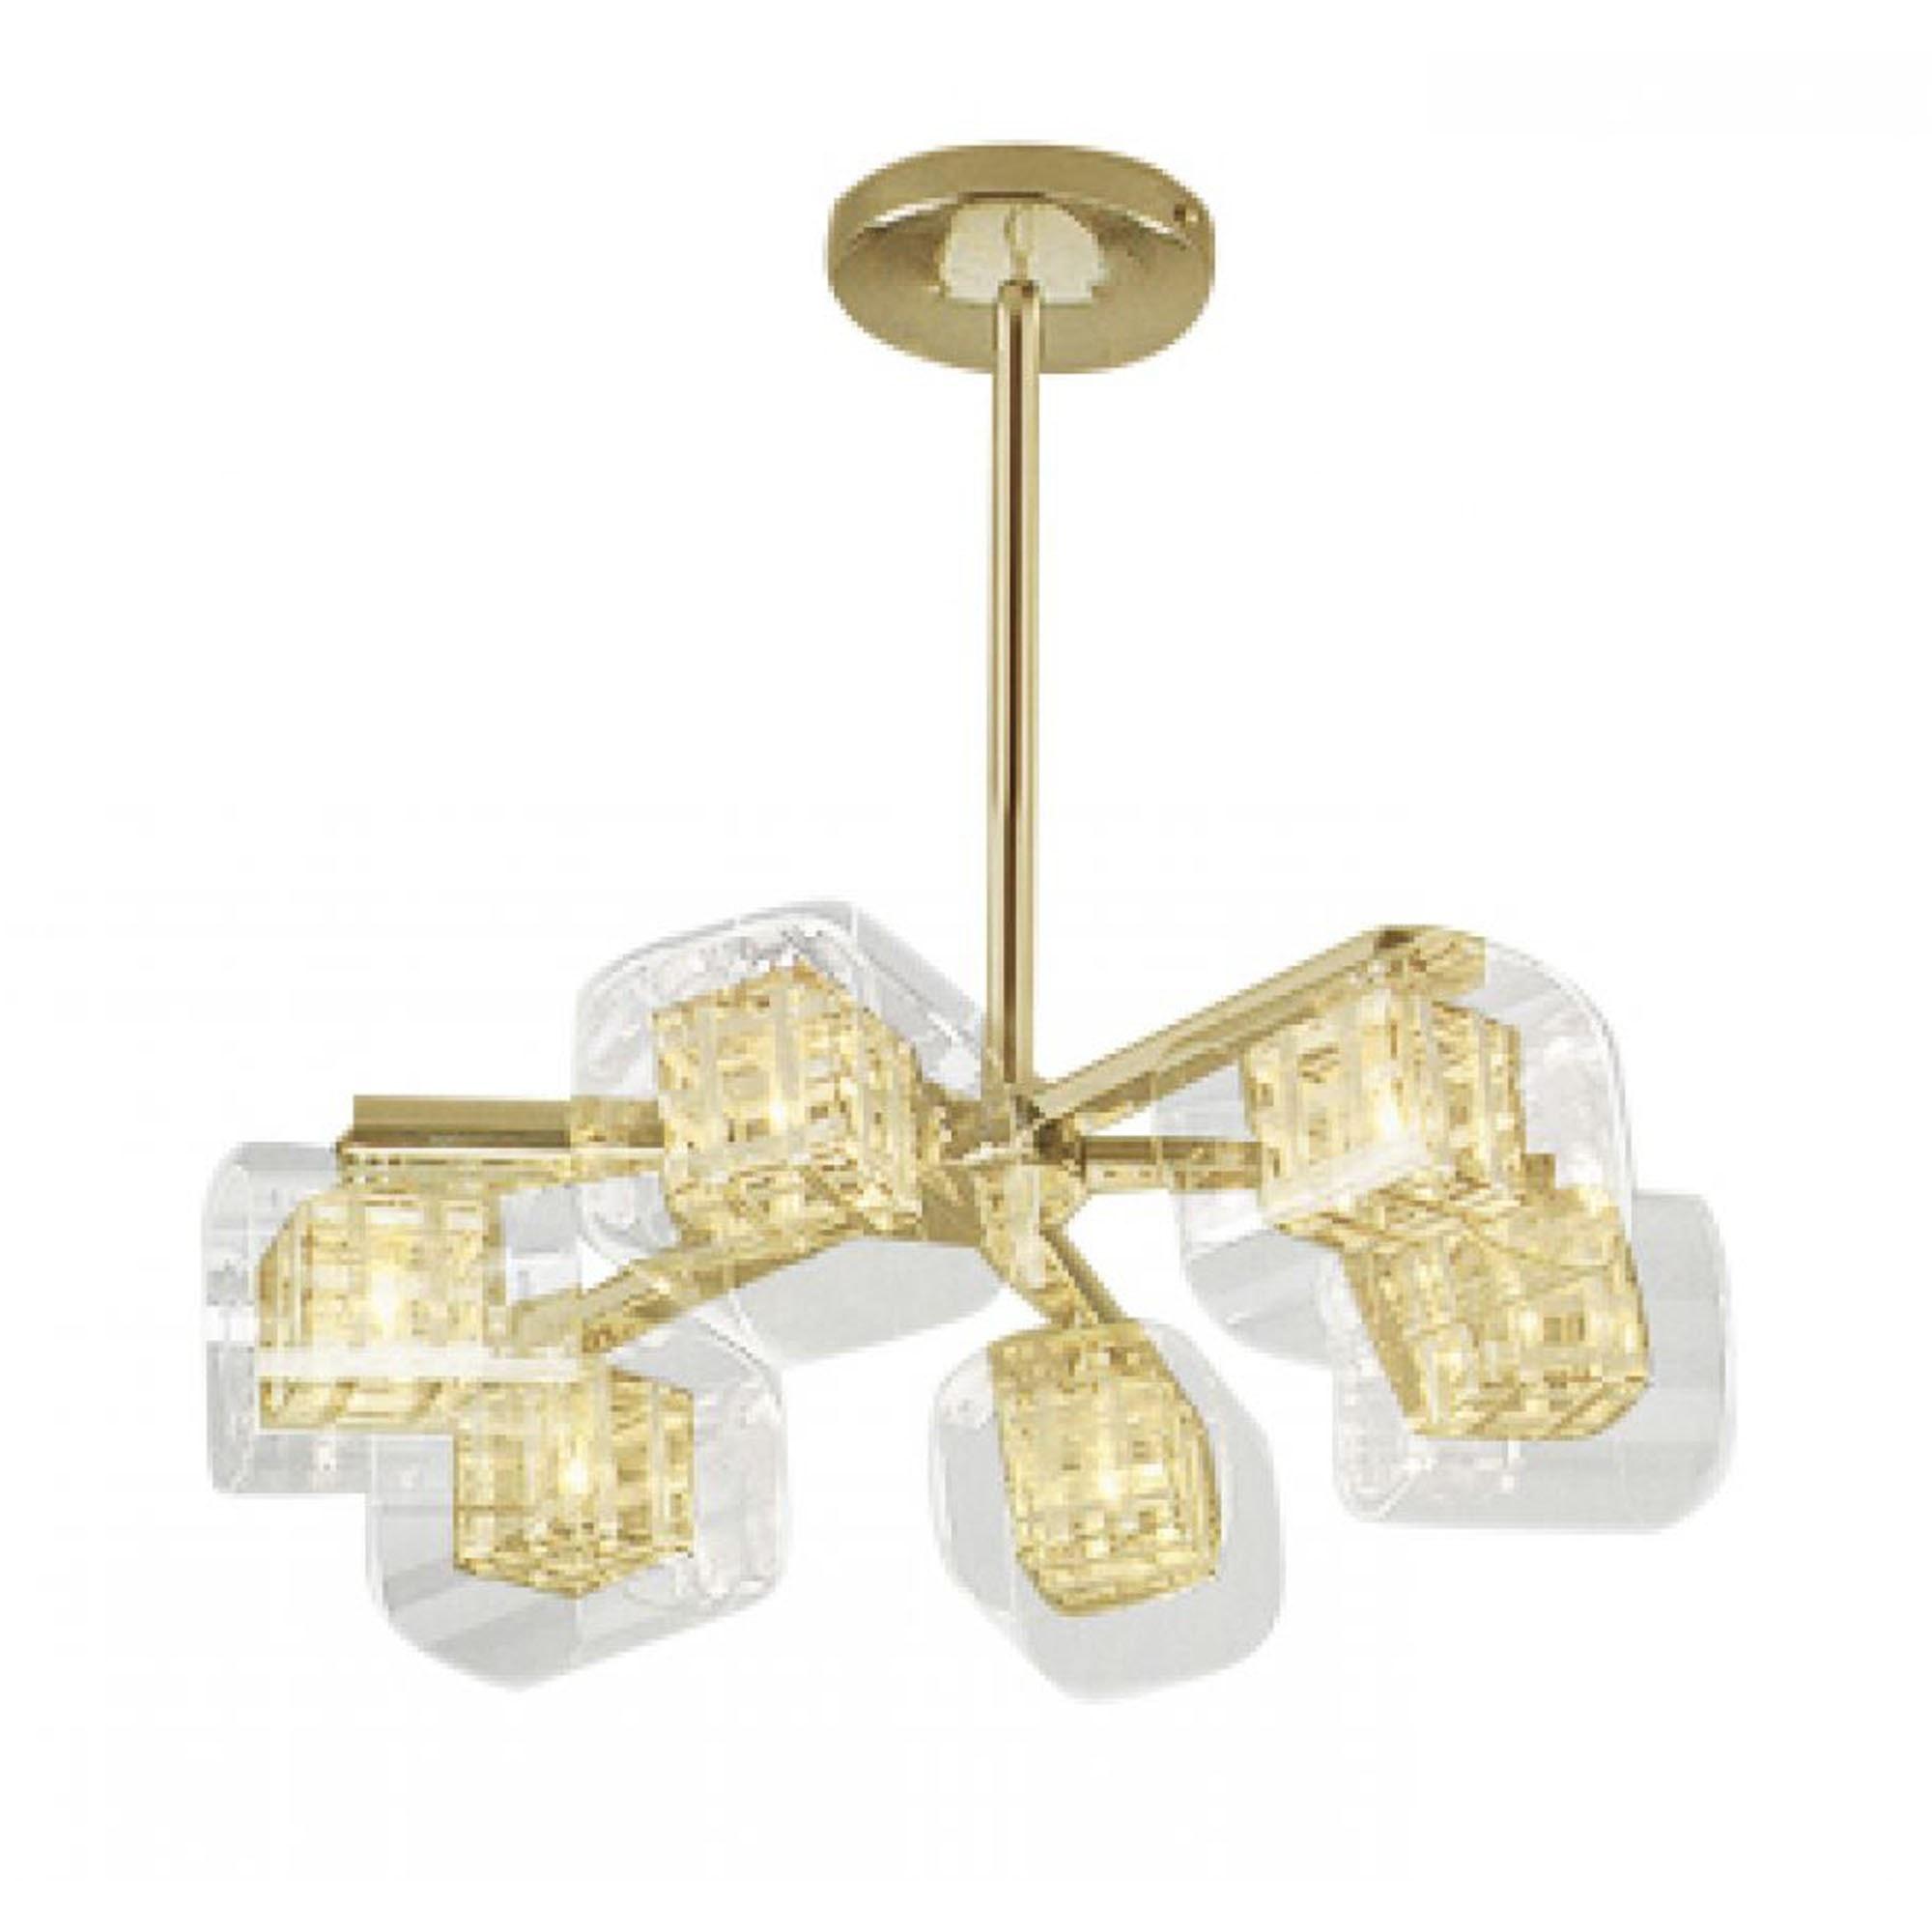 Contemporary avignon 6 light gold ceiling light